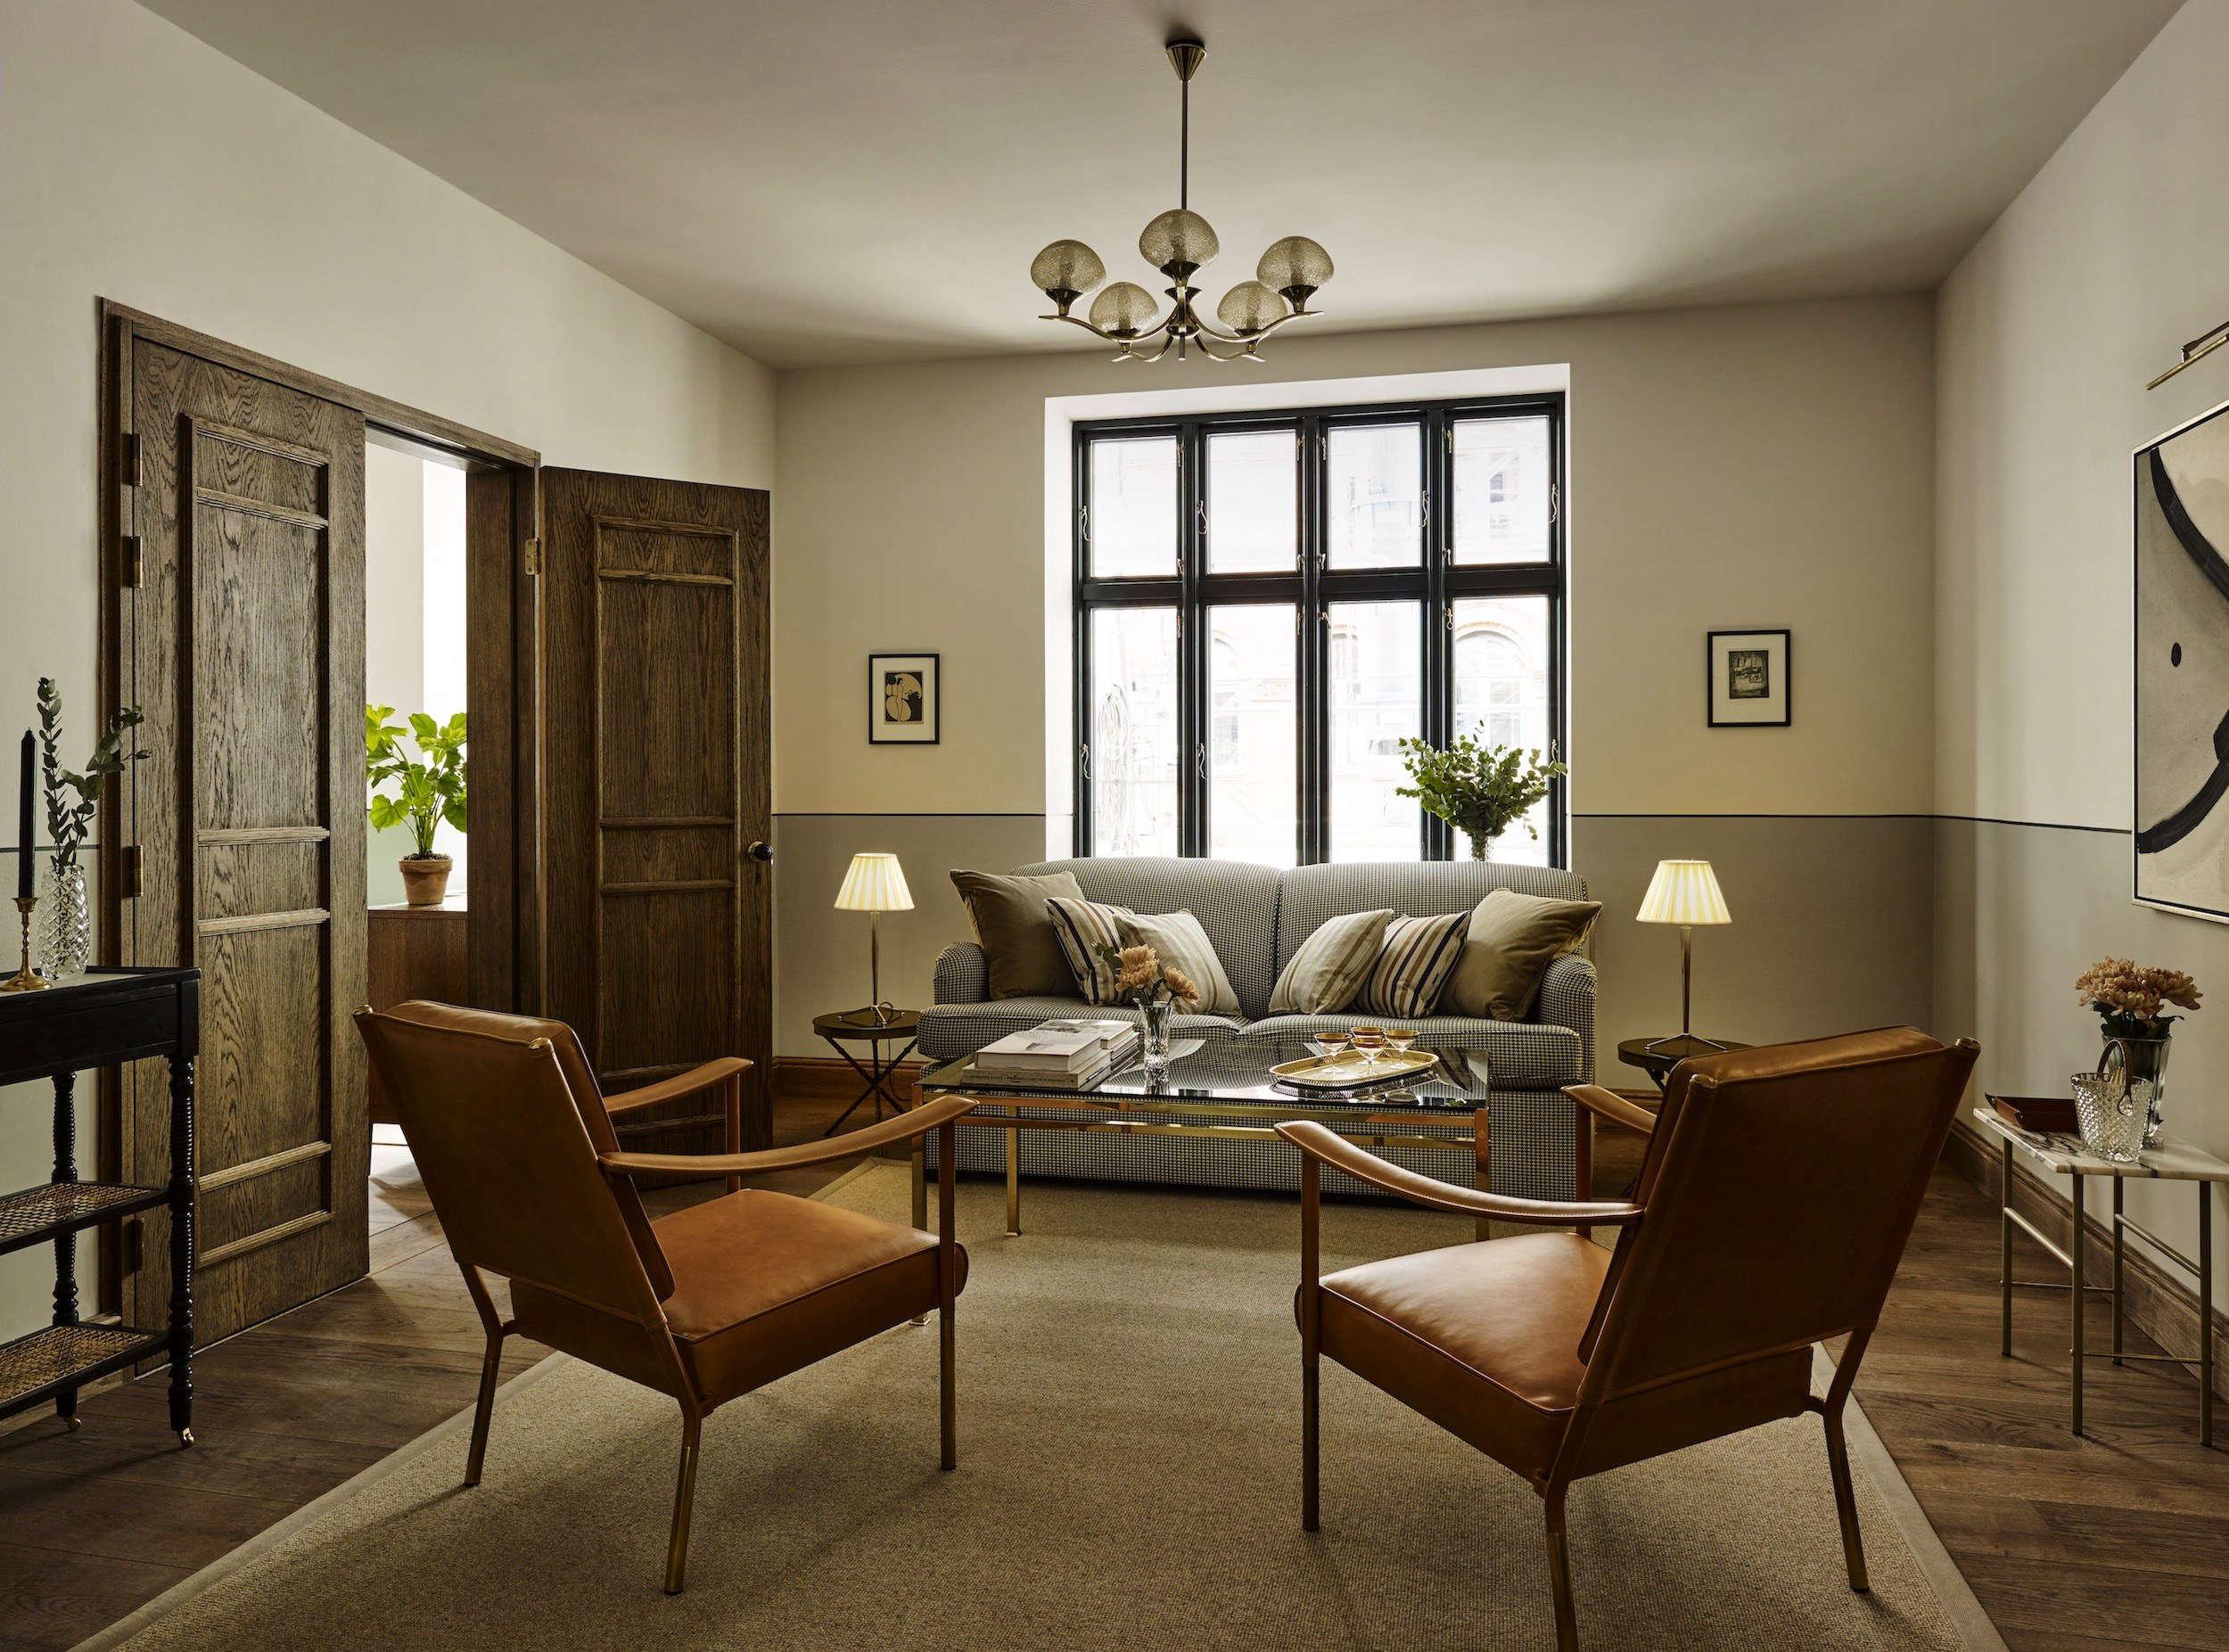 Hotel Stay Kopenhagen : Behind the curtain a former ballet dancer s romantic hotel in